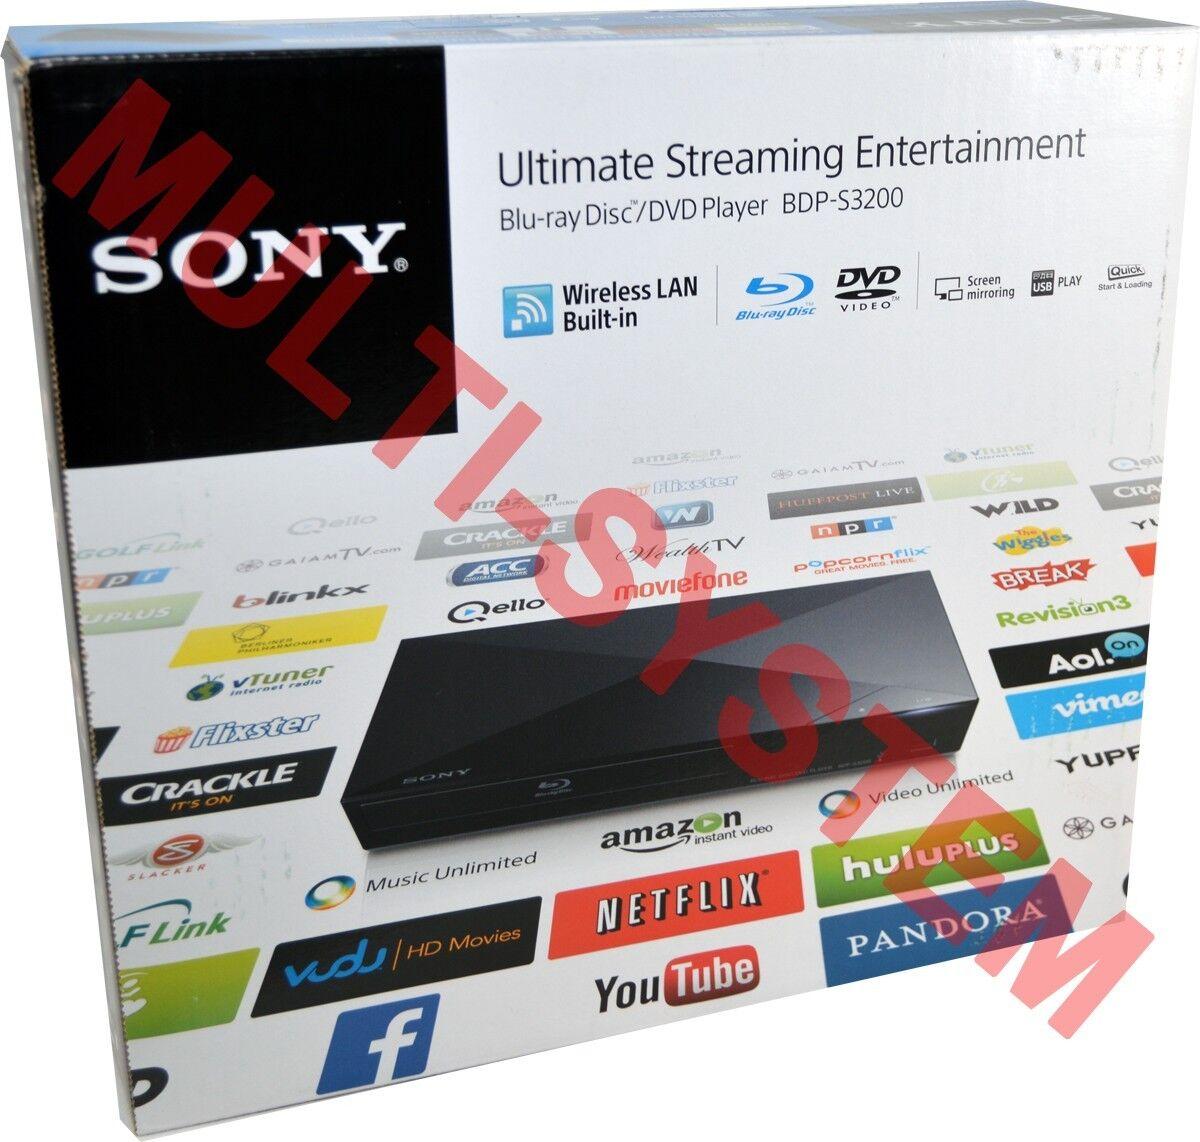 Sony blu ray coupon code